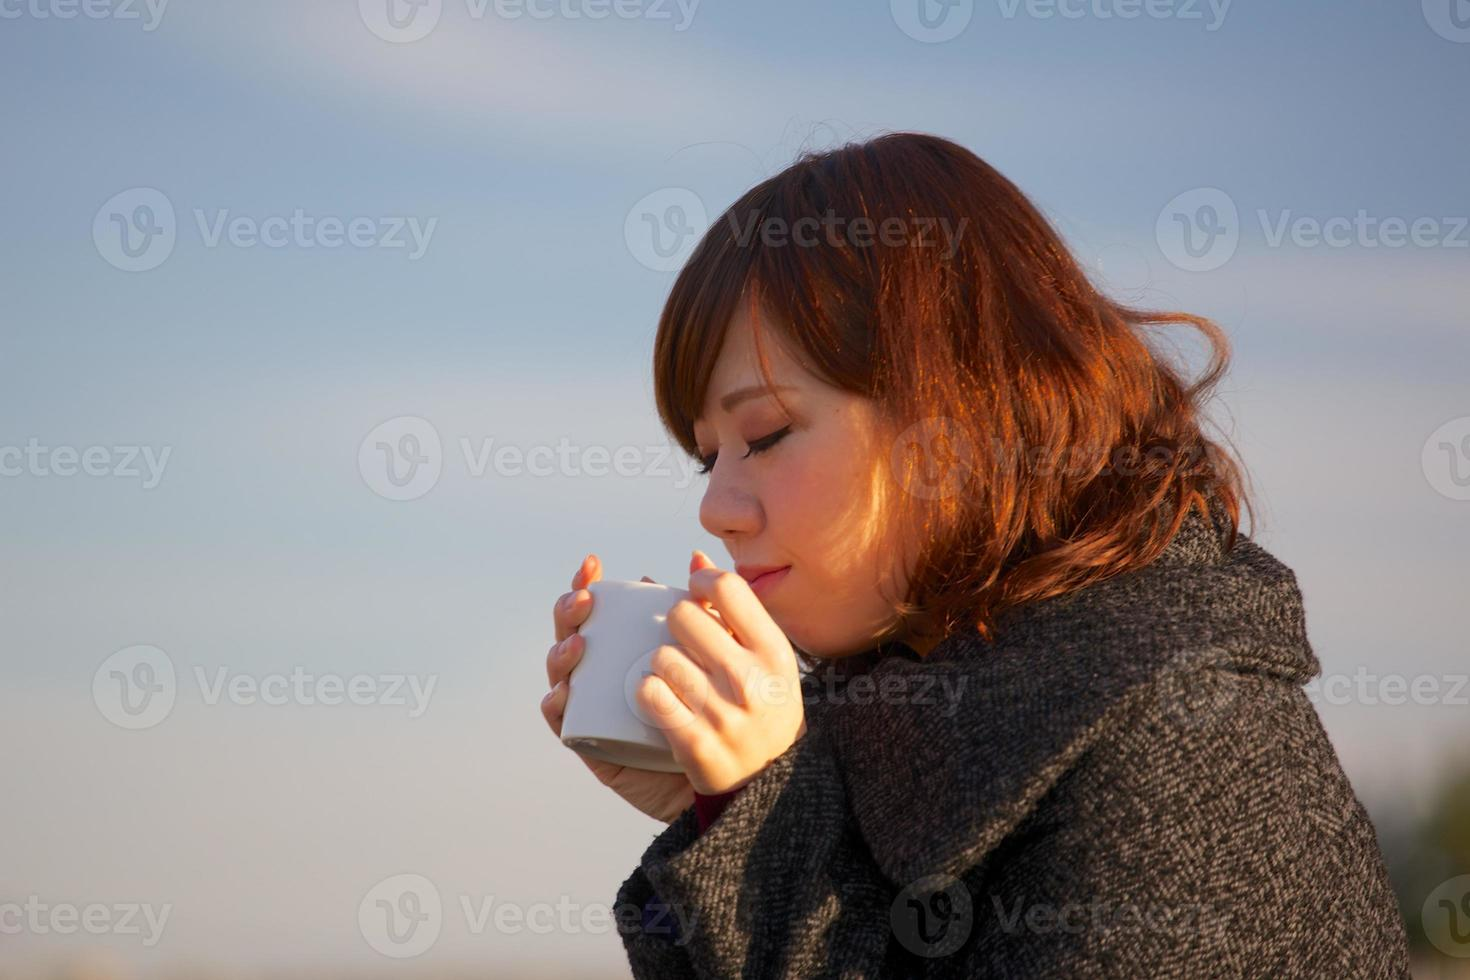 bere caffè caldo foto